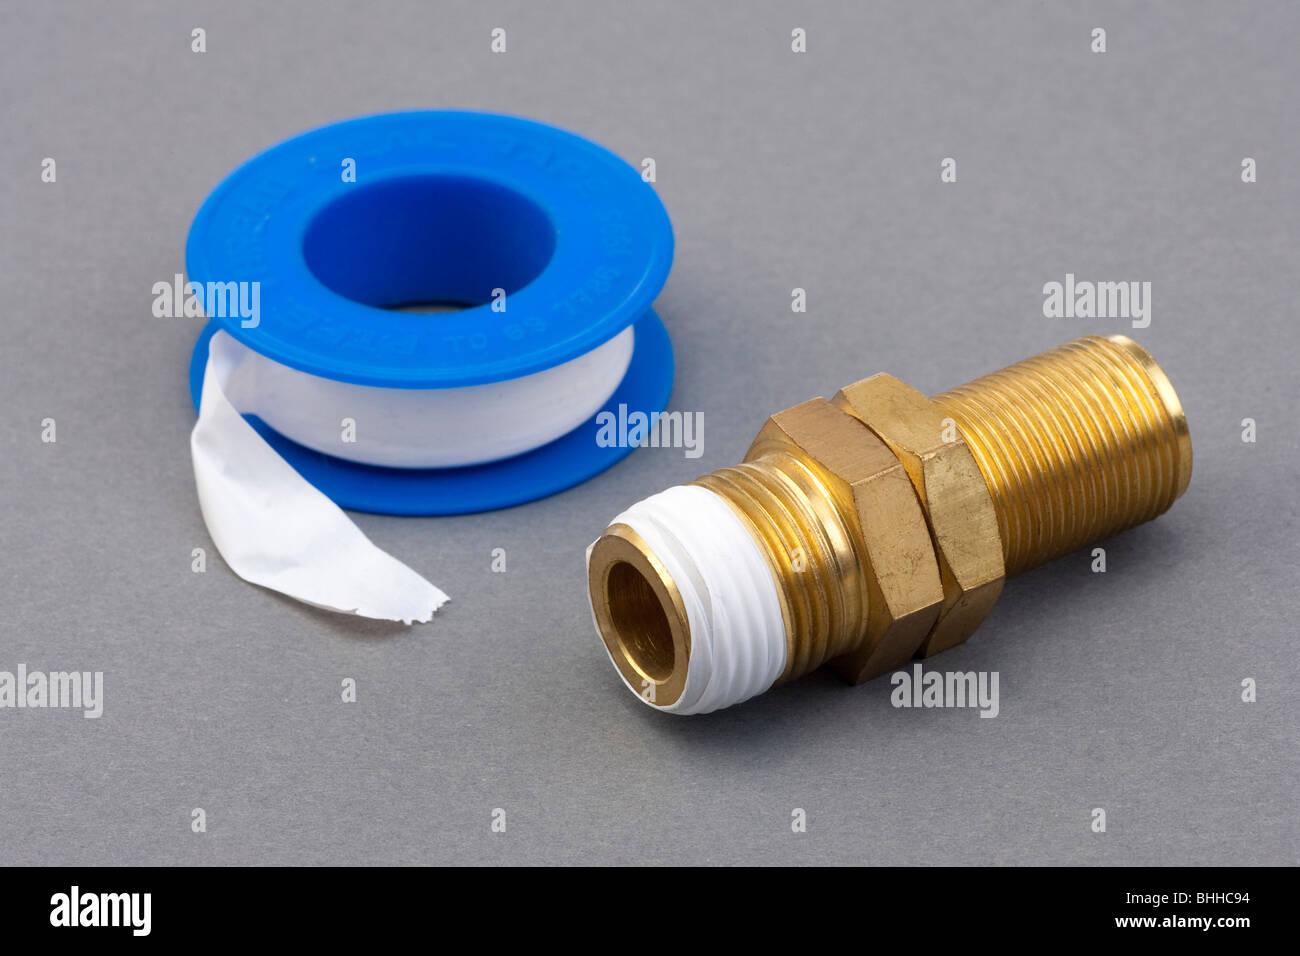 Teflon tape on metal fittings plumbing contractor